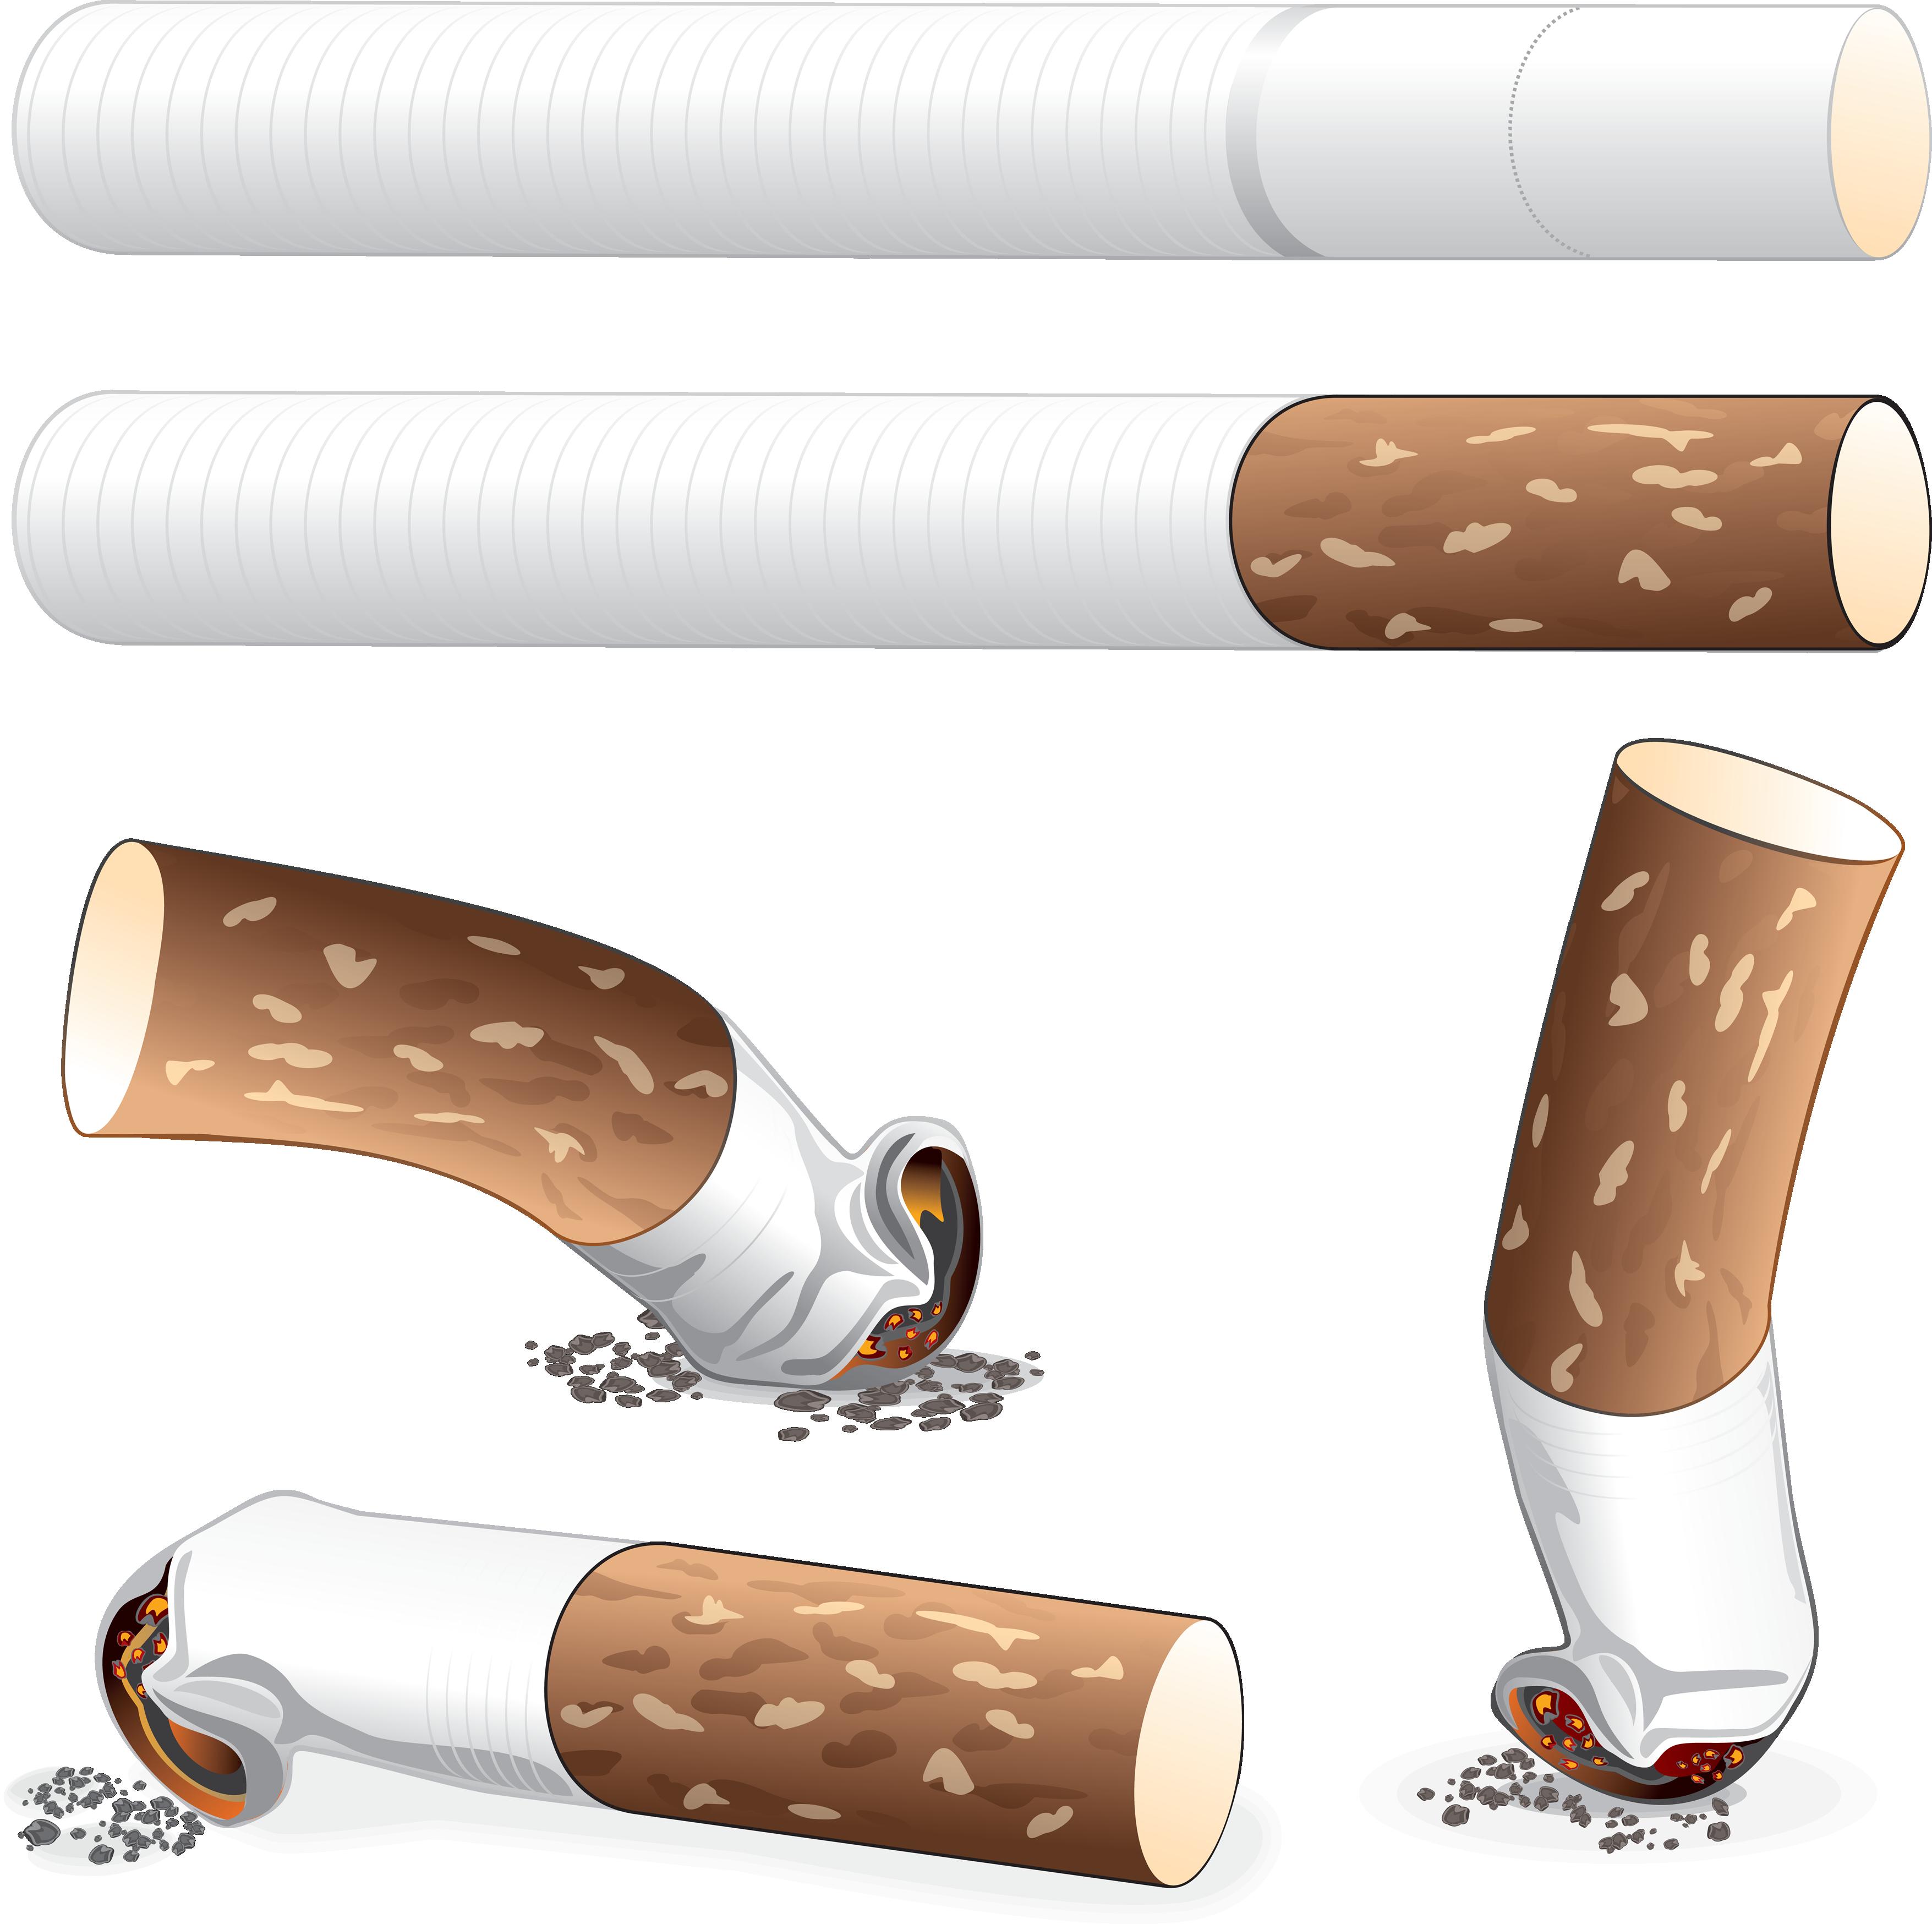 Cigarette png images free. Cigar clipart vector